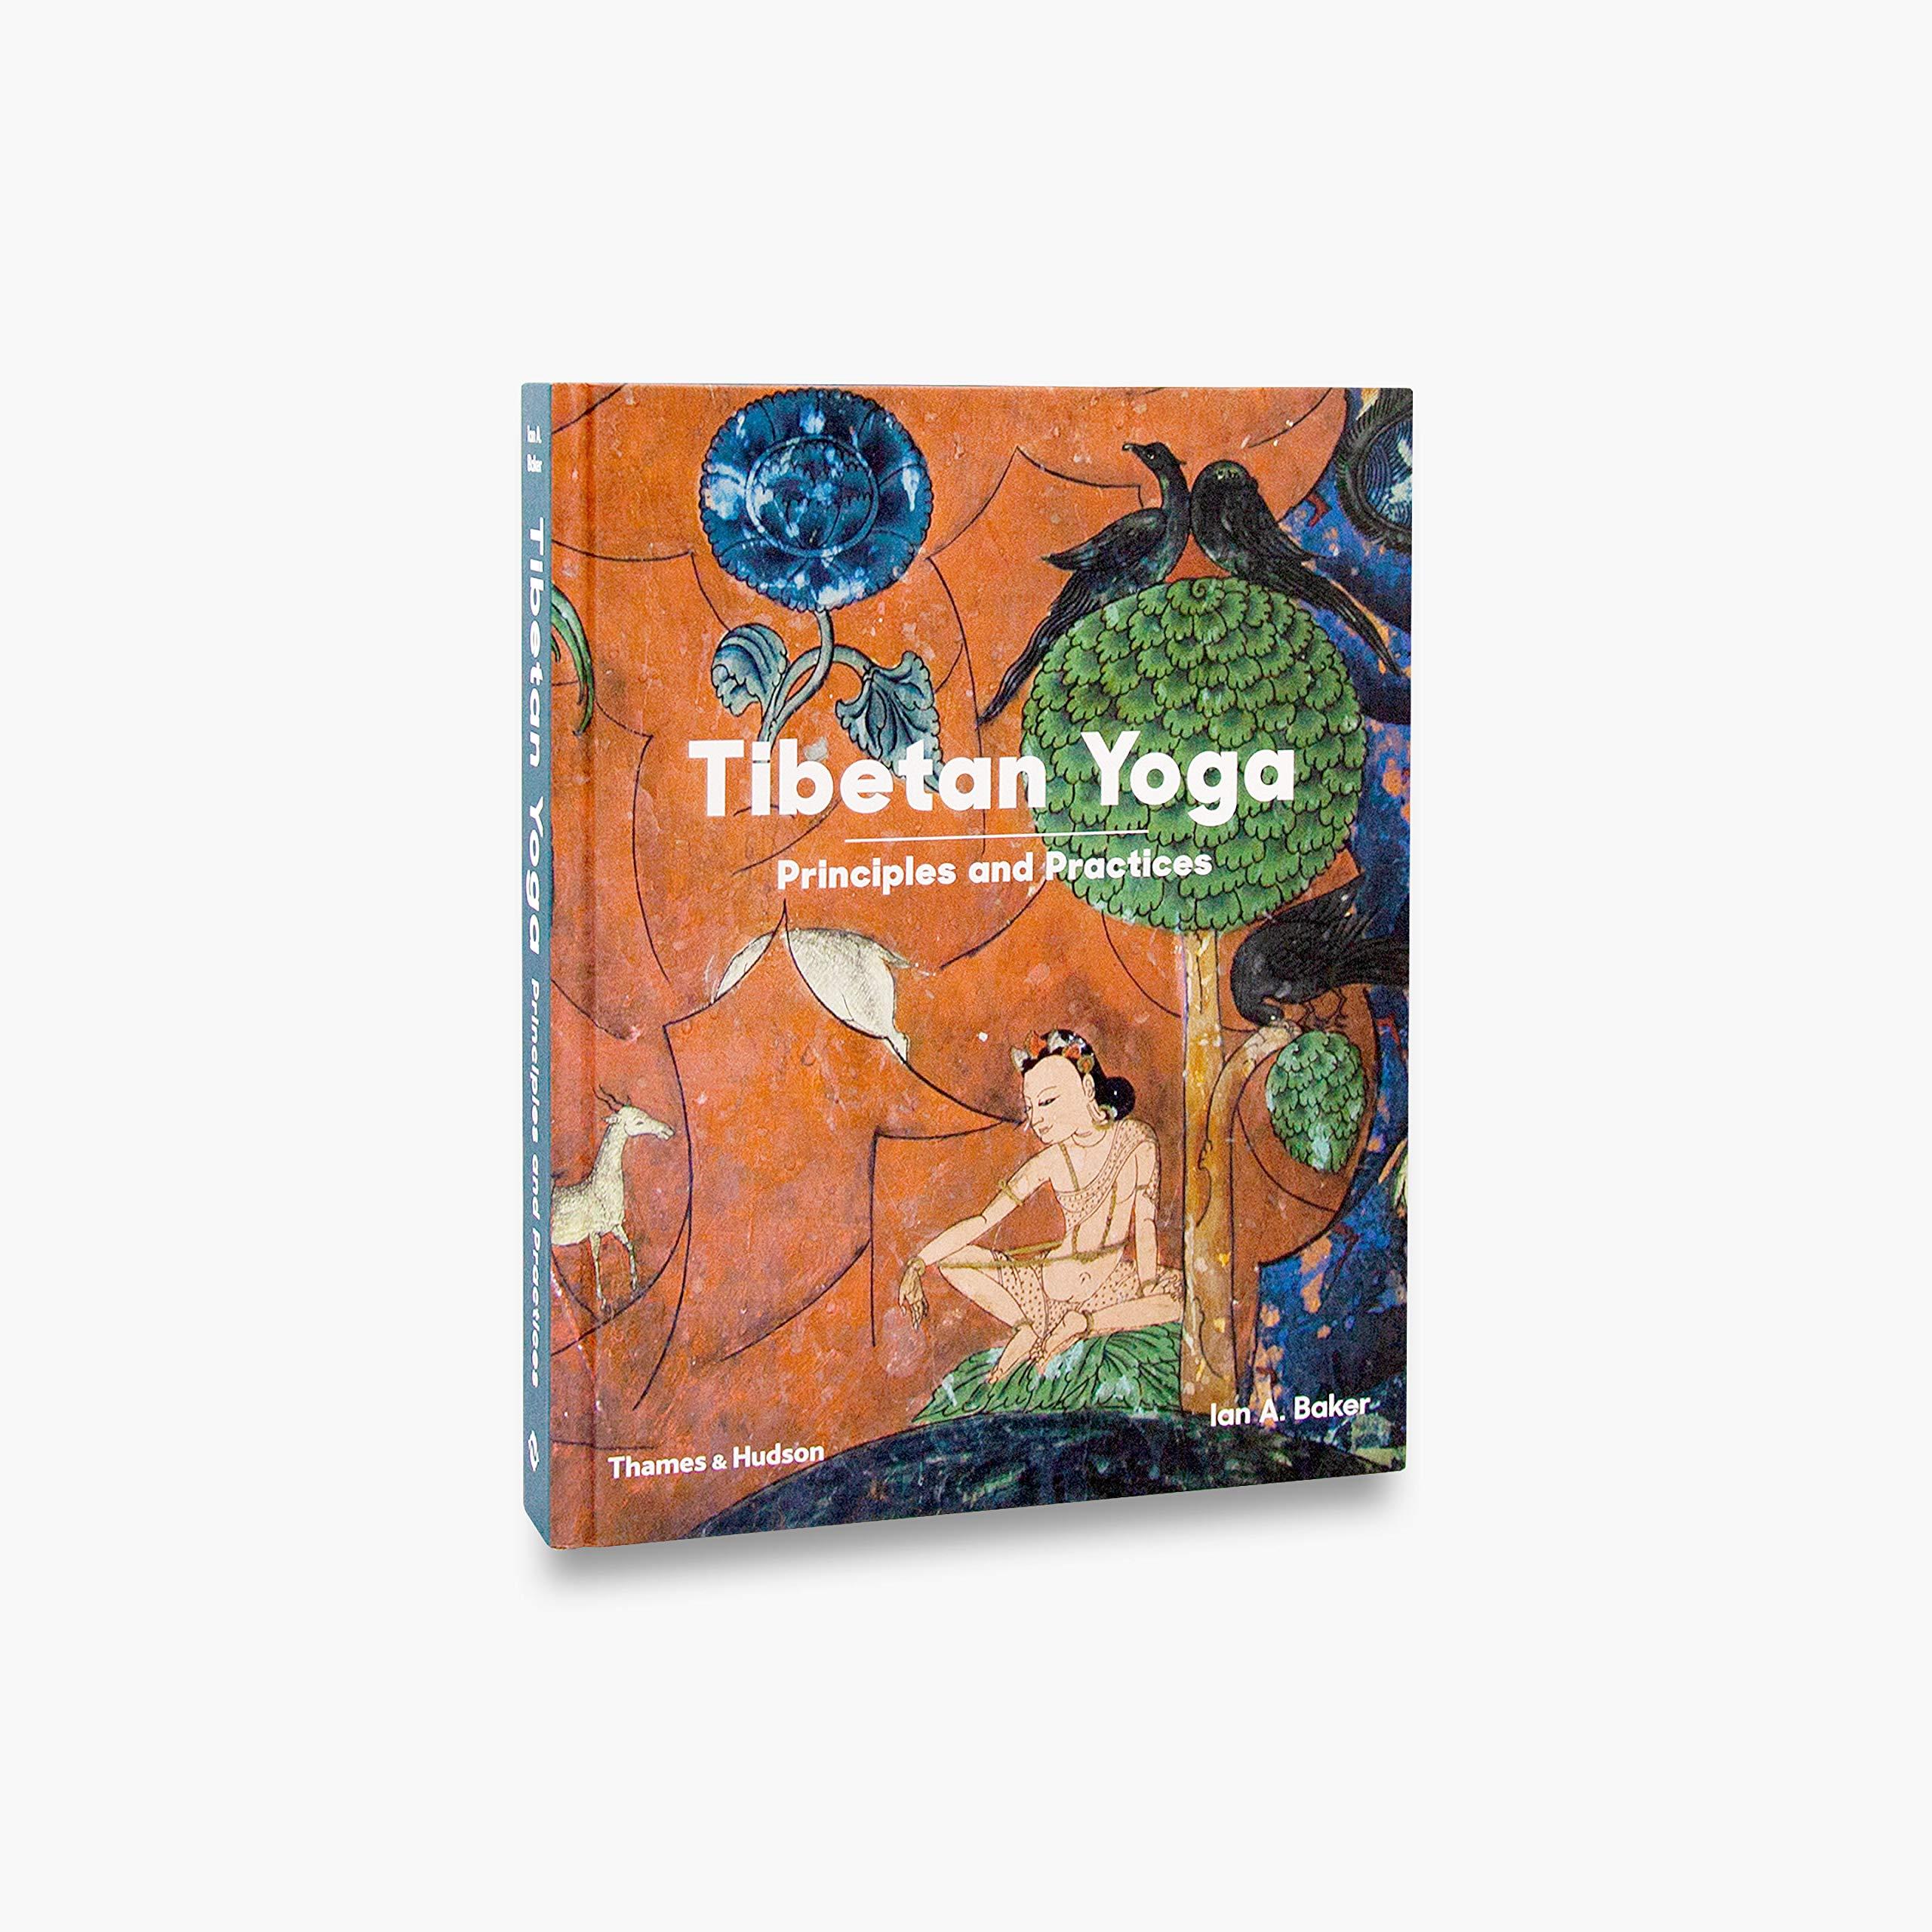 Tibetan Yoga: Principles and Practices: Amazon.es: Ian A ...